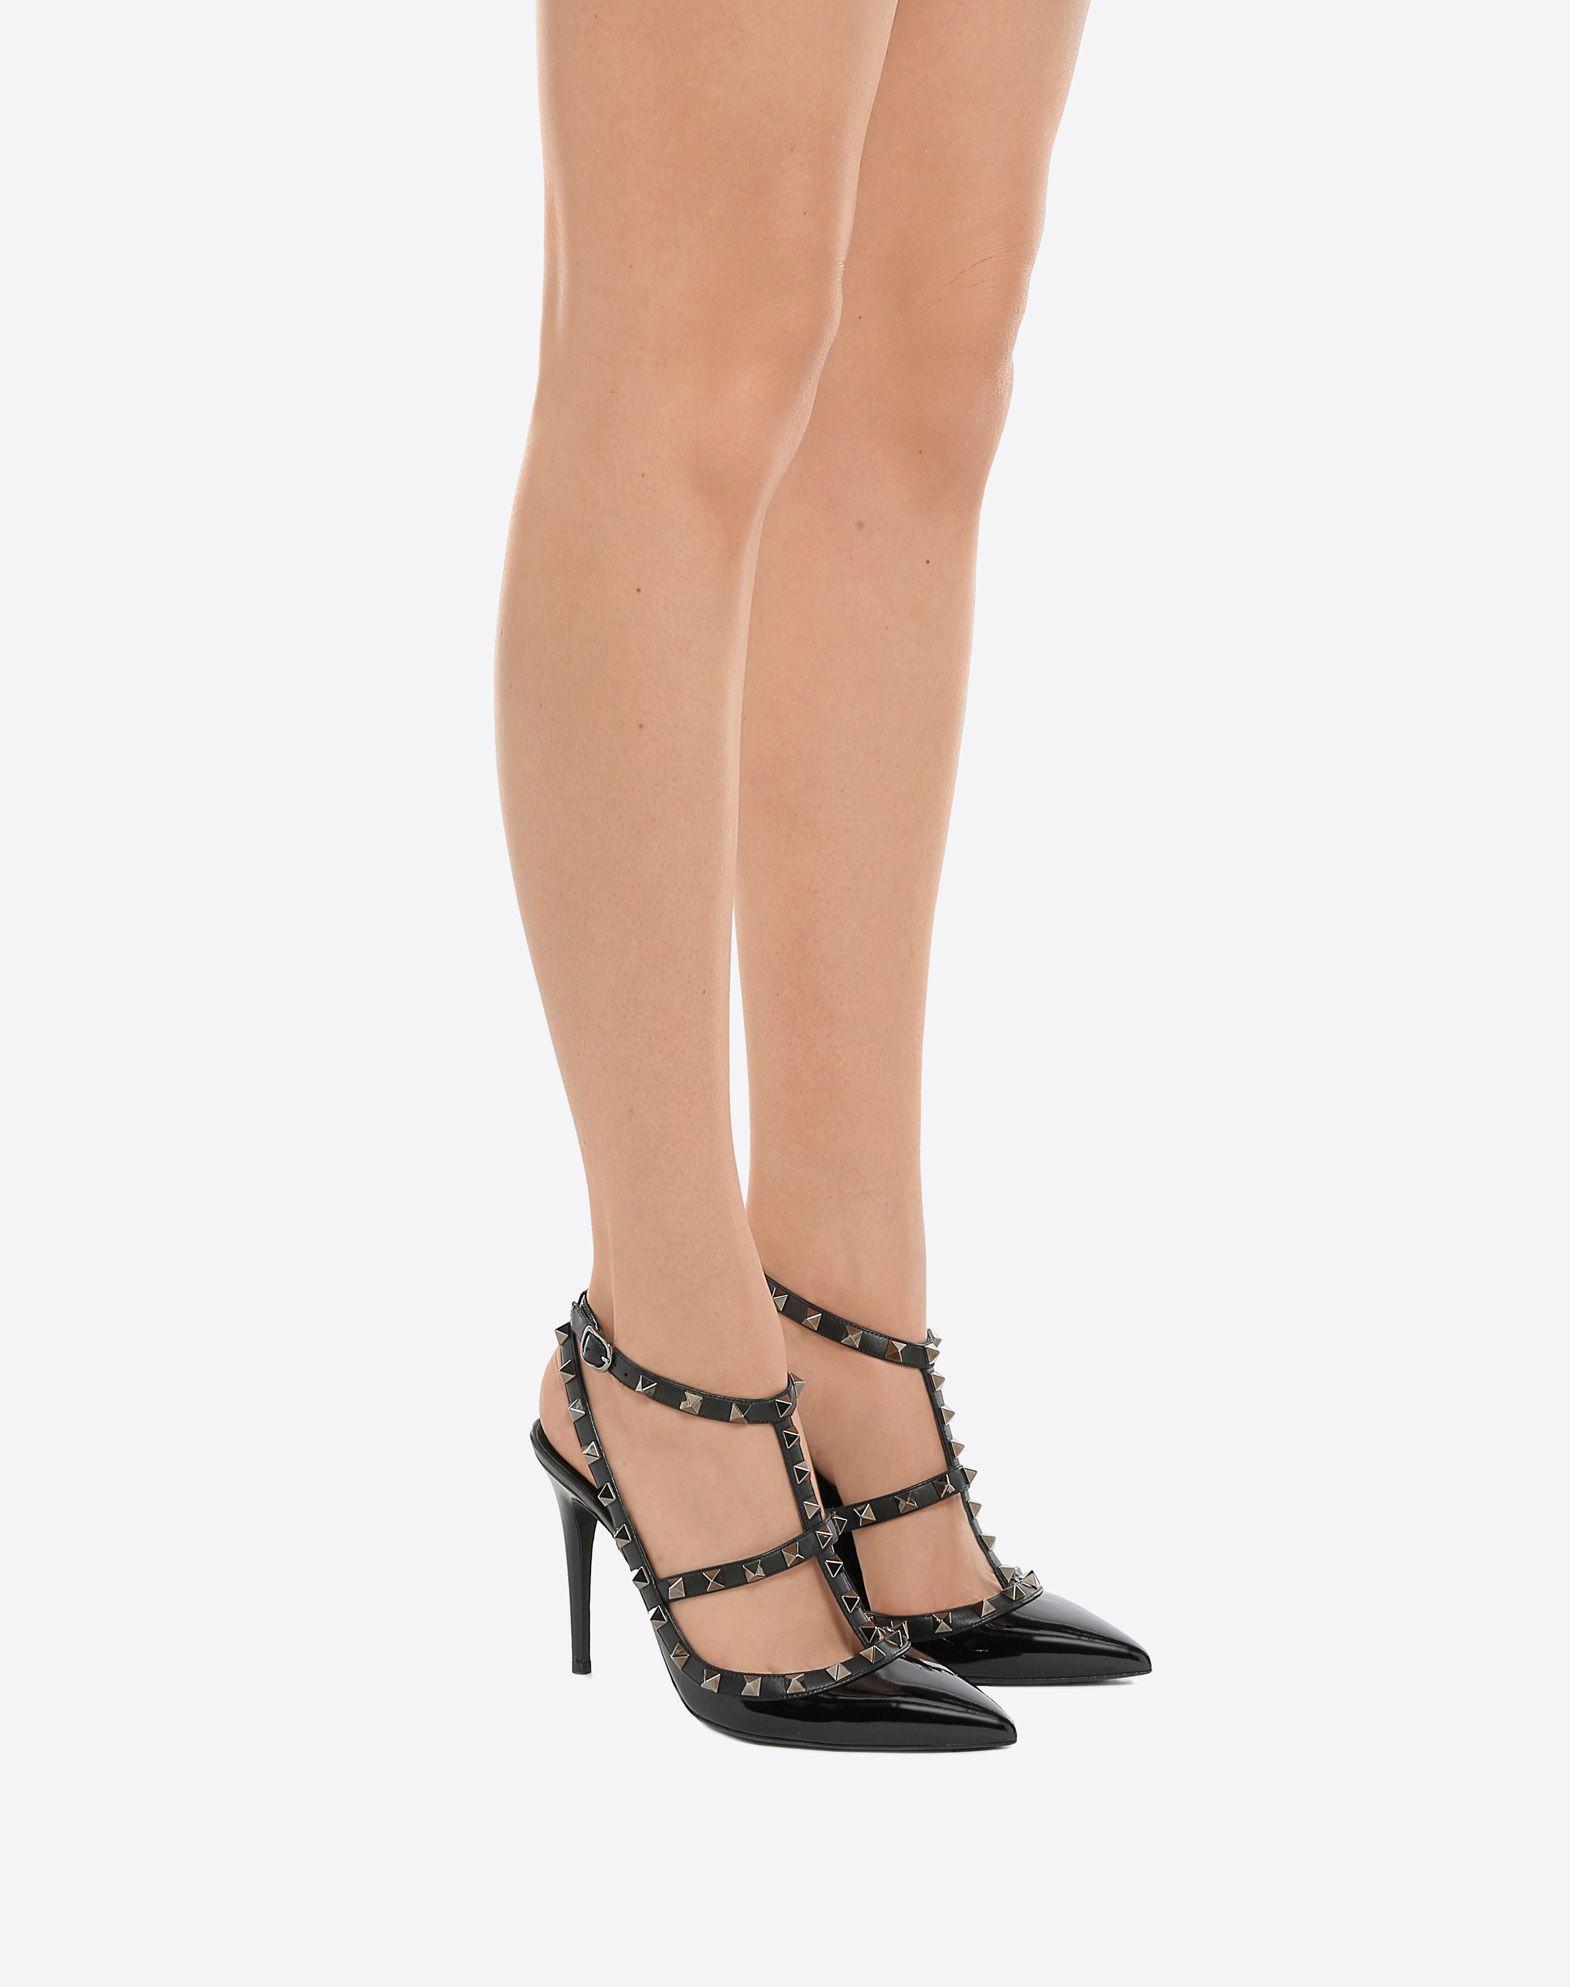 VALENTINO GARAVANI Rockstud Noir Ankle Strap Pump HIGH HEEL PUMPS D a